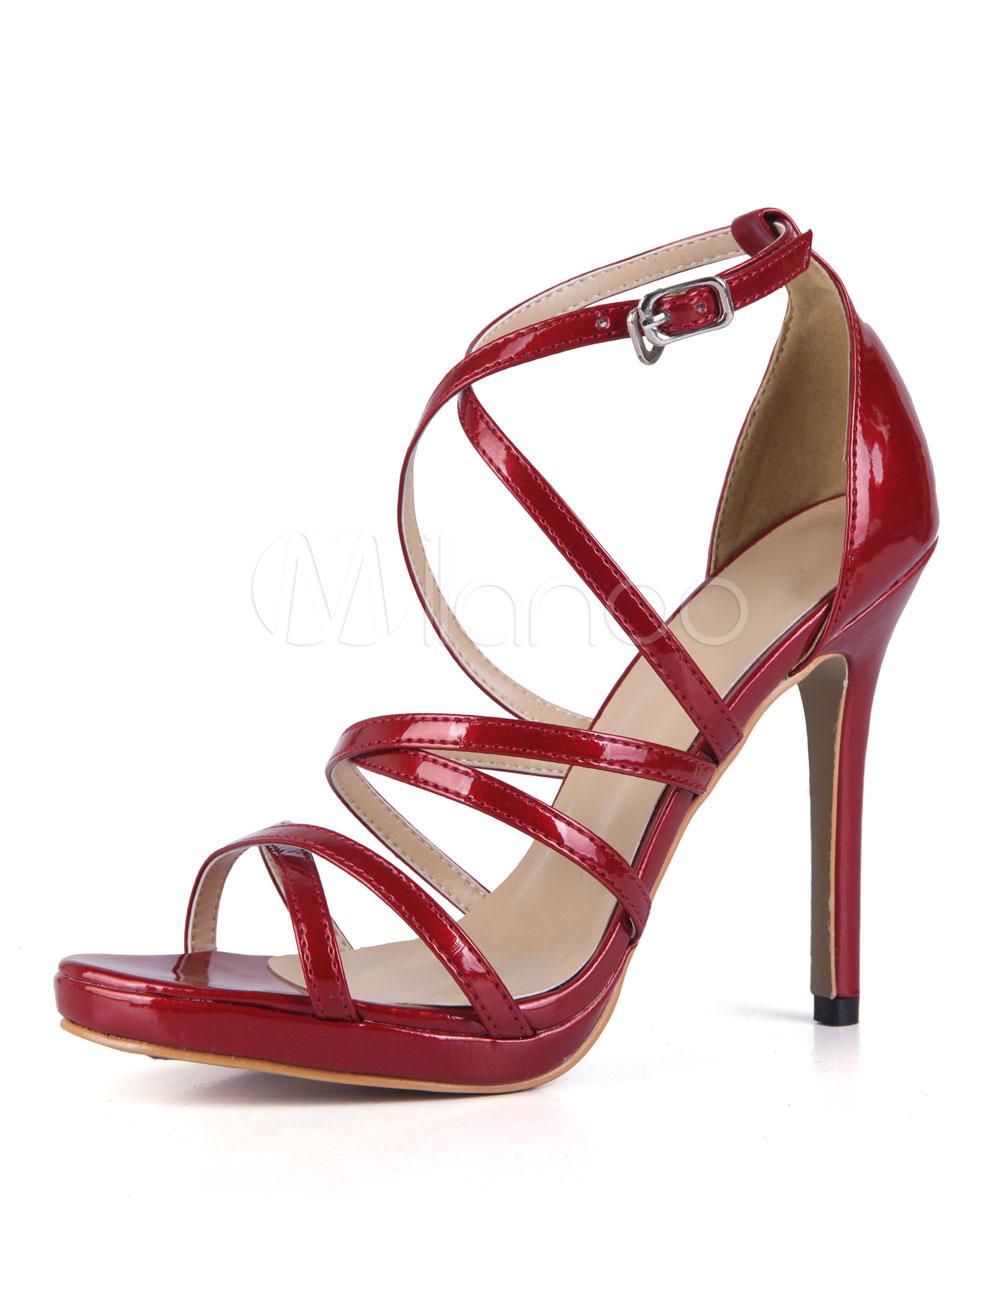 High Heel Sandals Women Shoes Burgundy